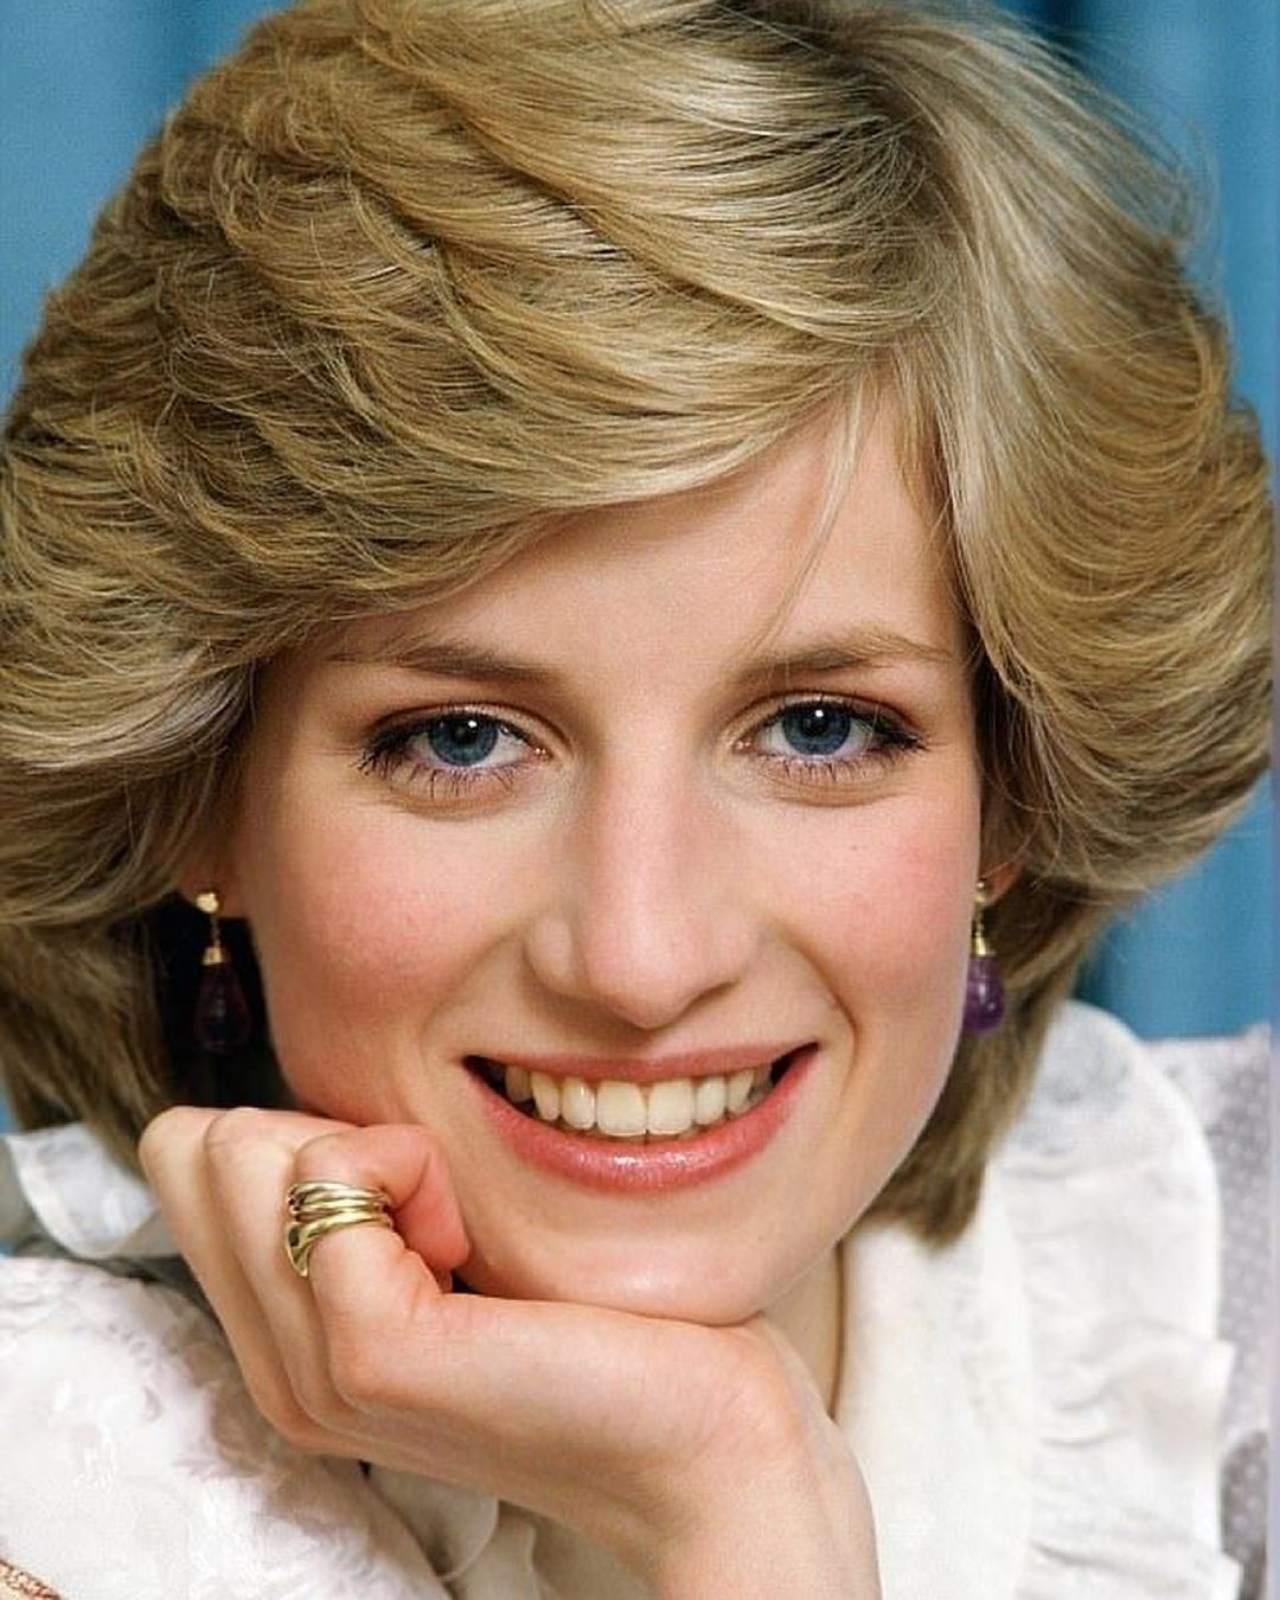 Sonrisa de la princesa Diana